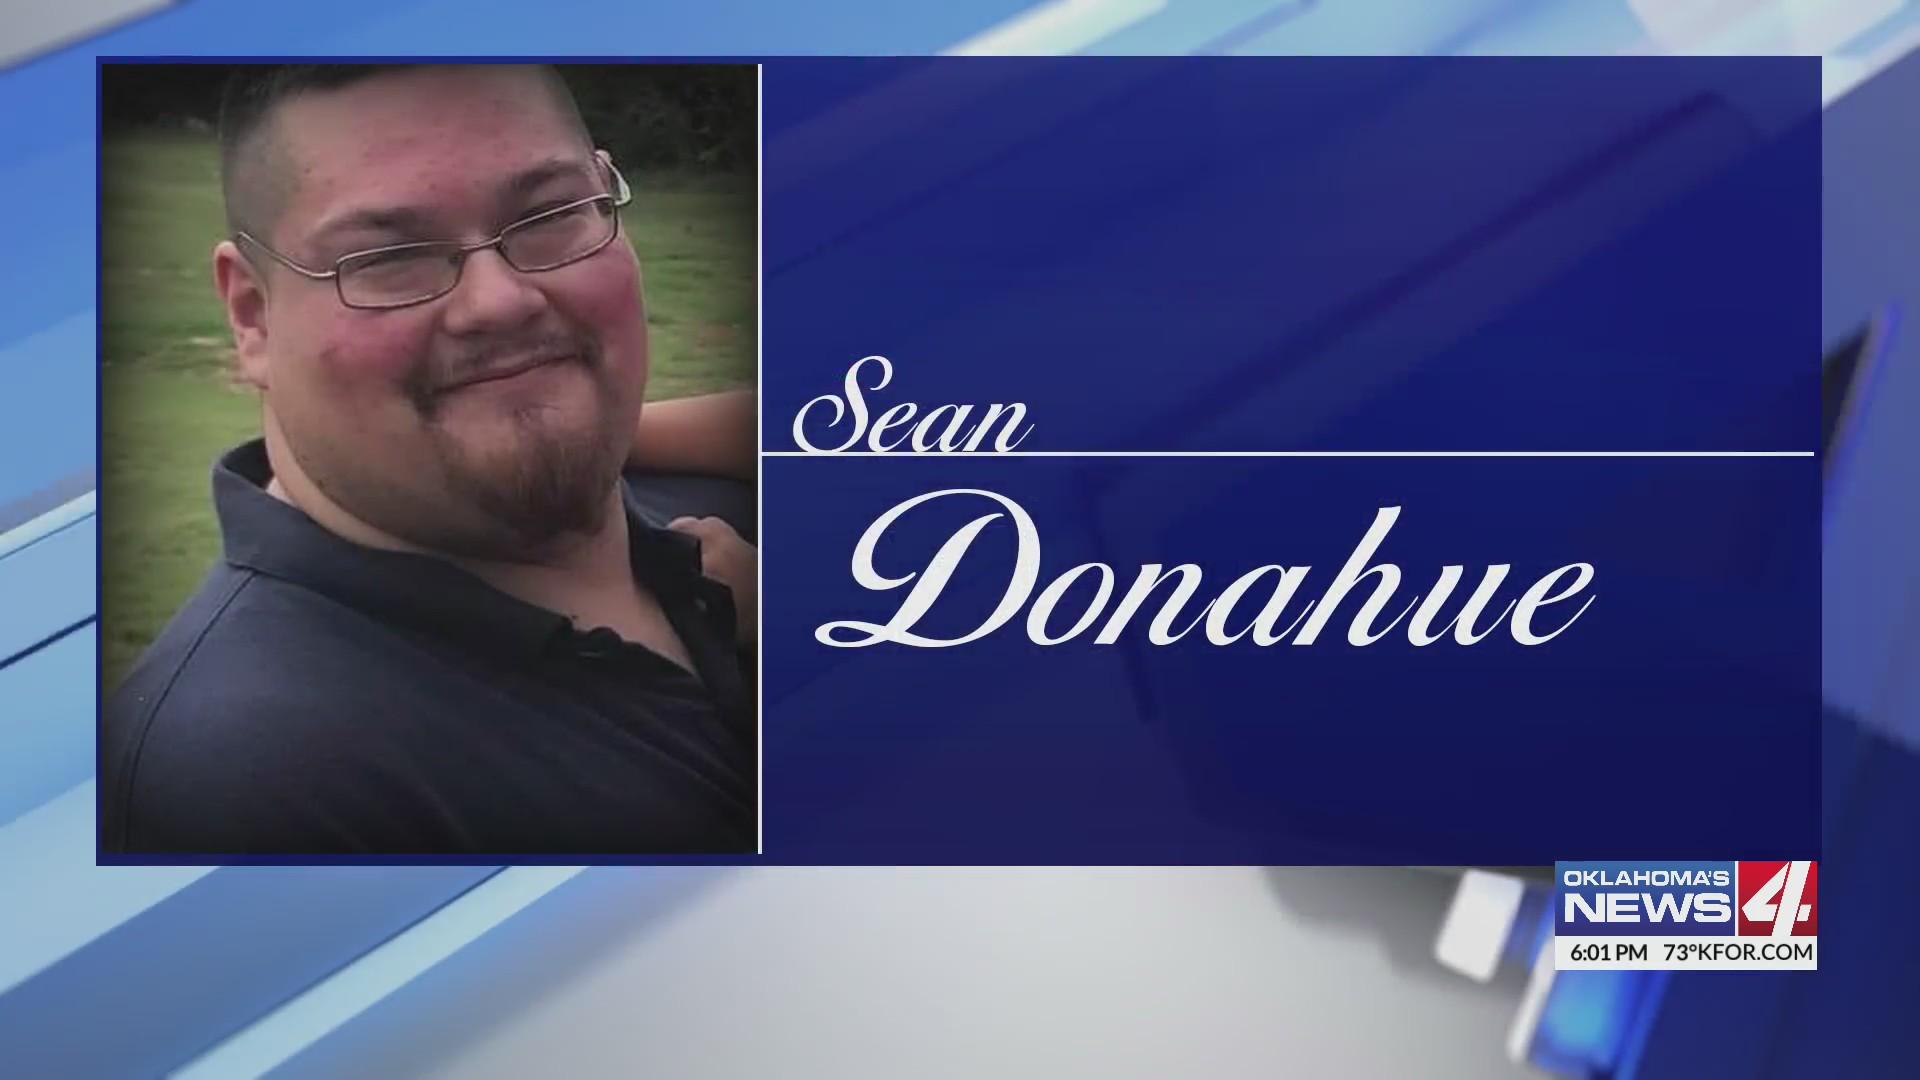 Sean Donahue in memoriam